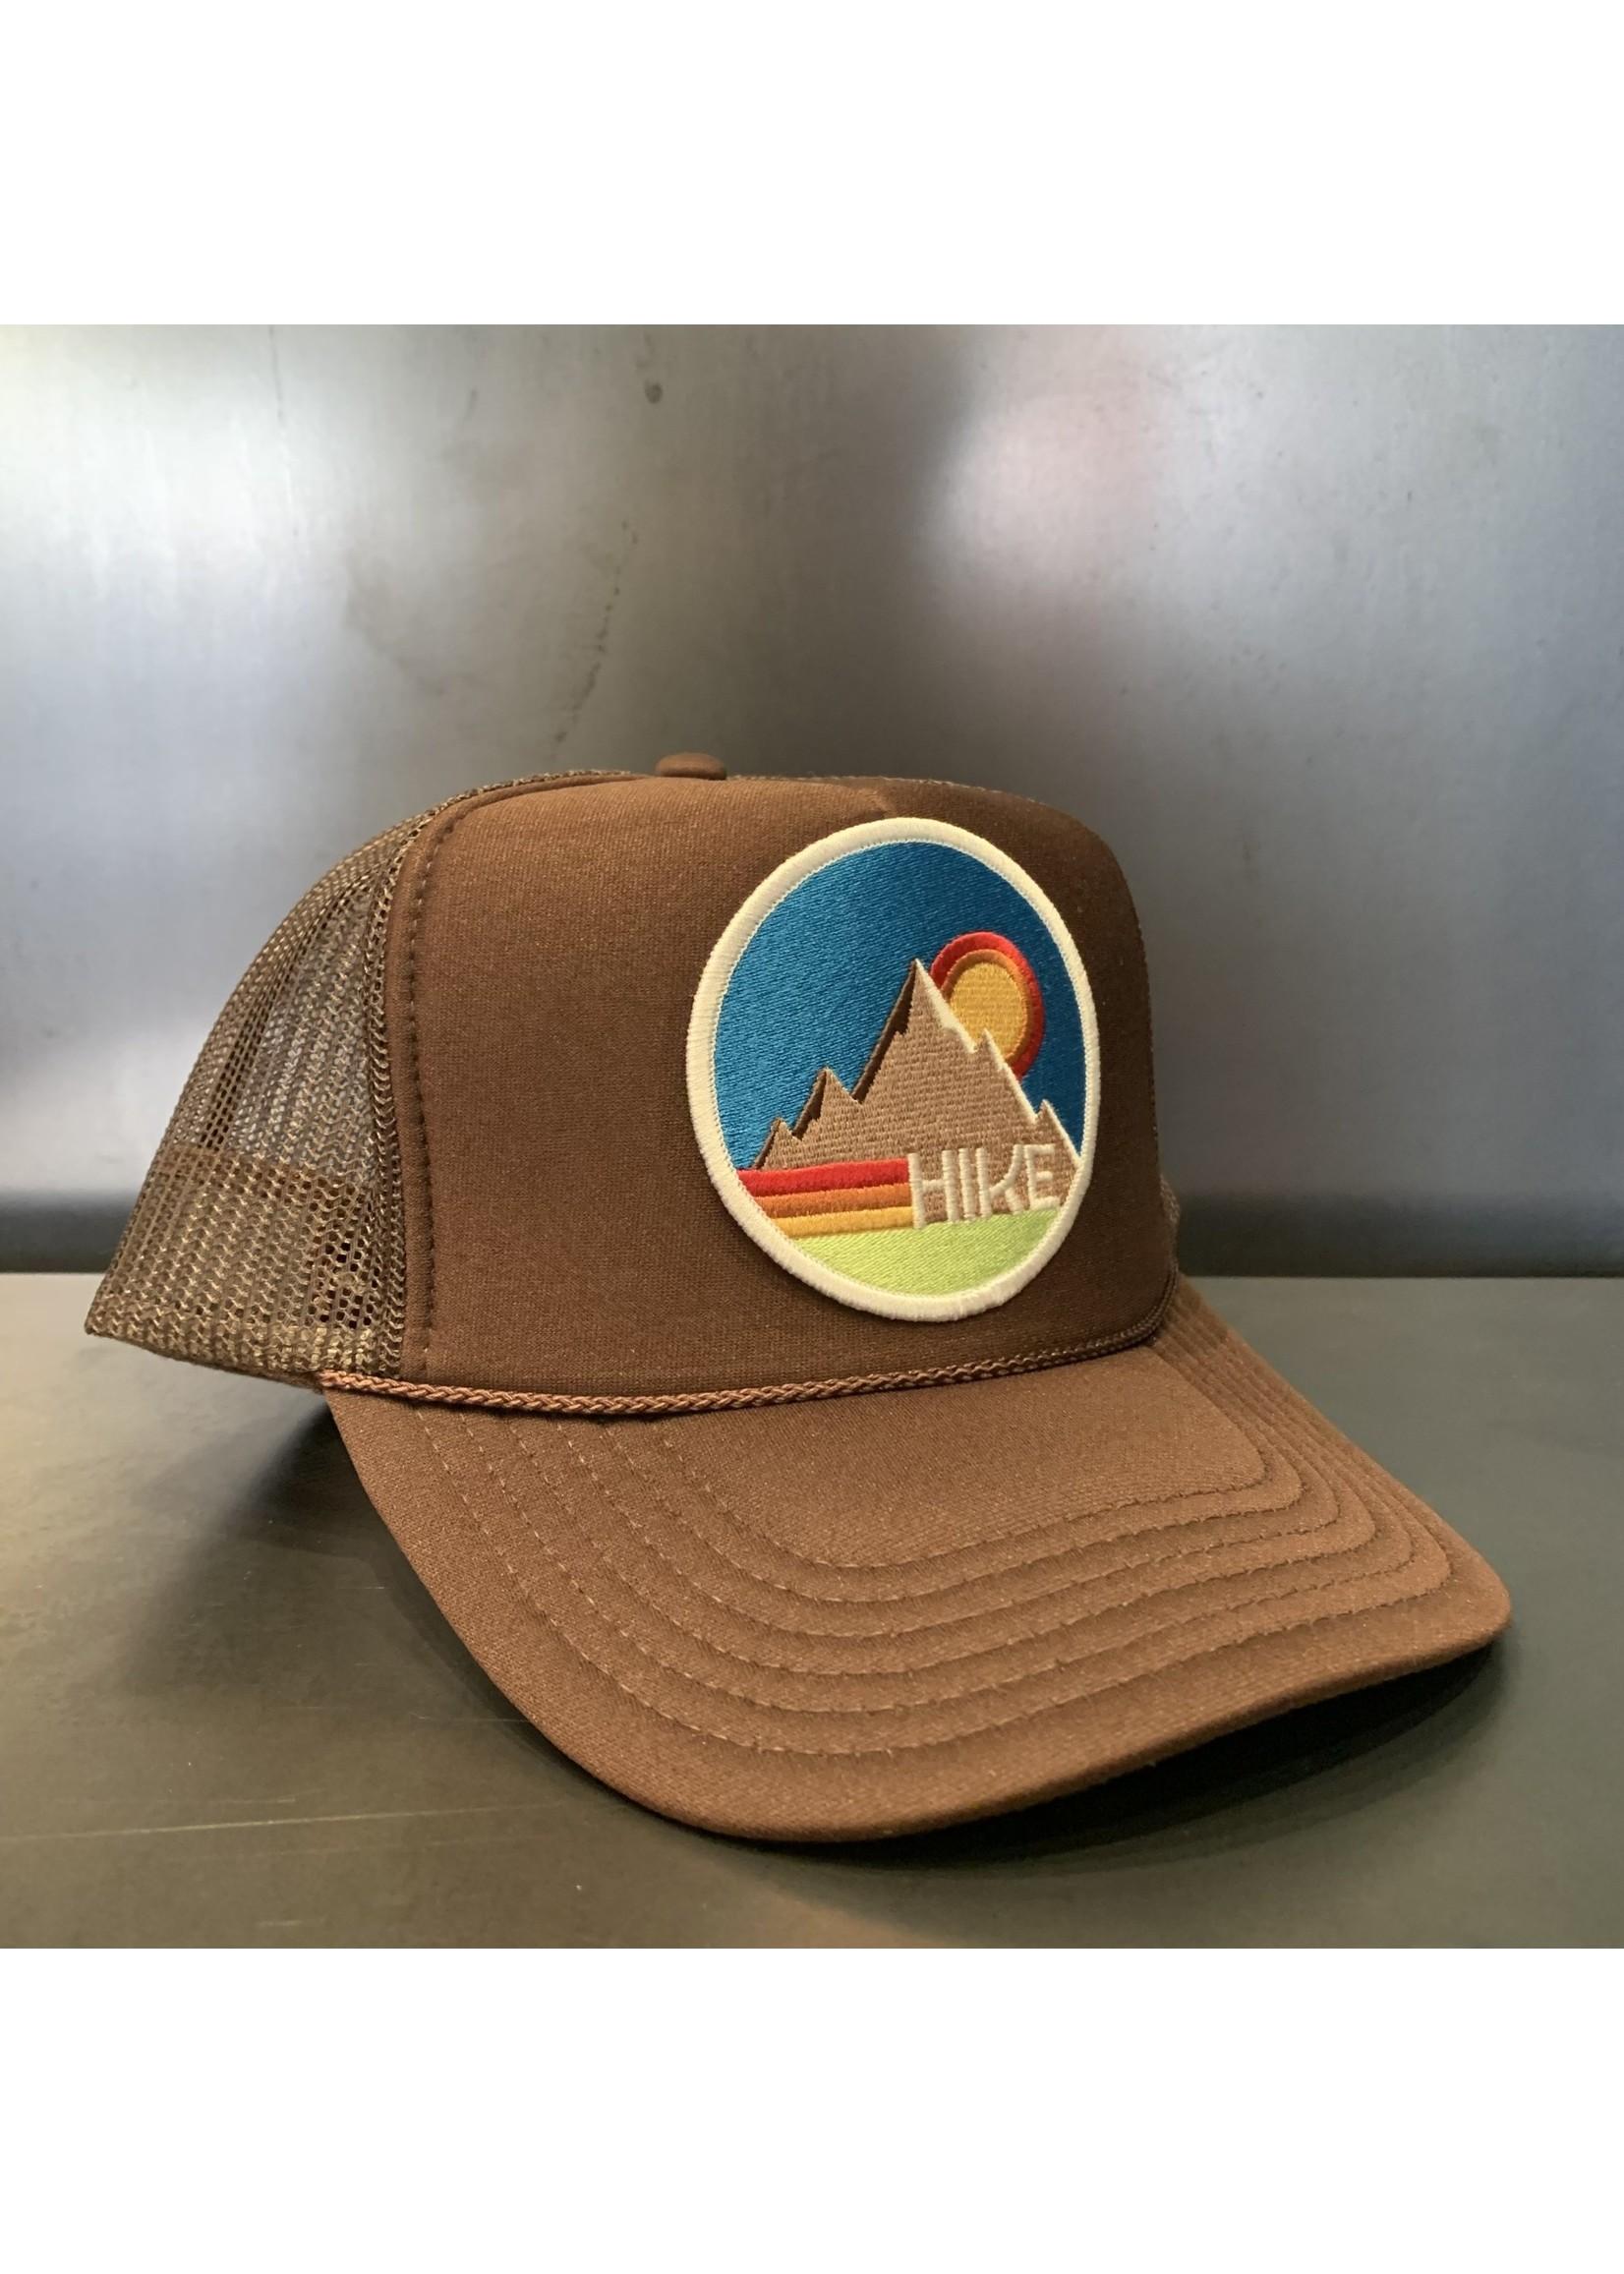 Port Sandz Port Sandz Hike Trucker Hat